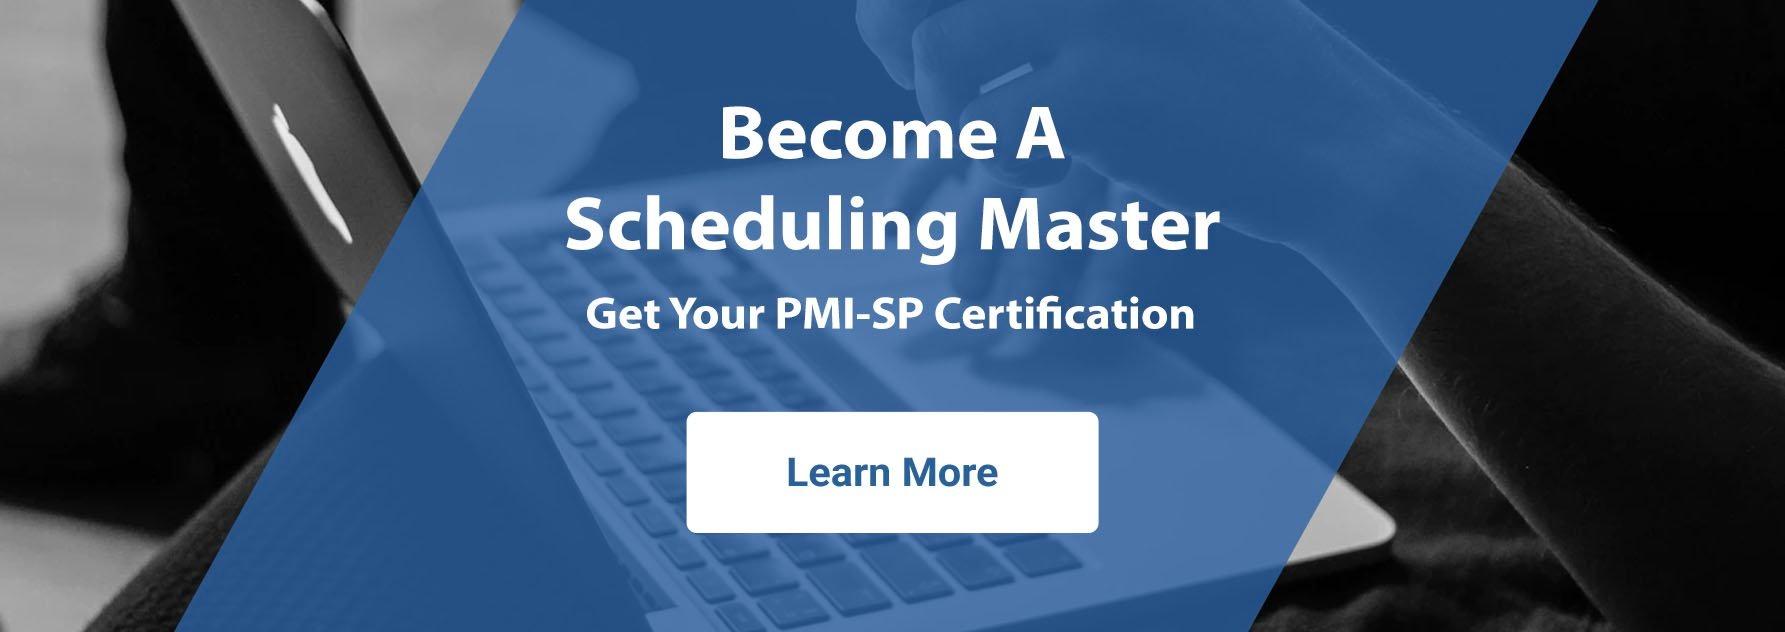 PMI-SP Certification Course